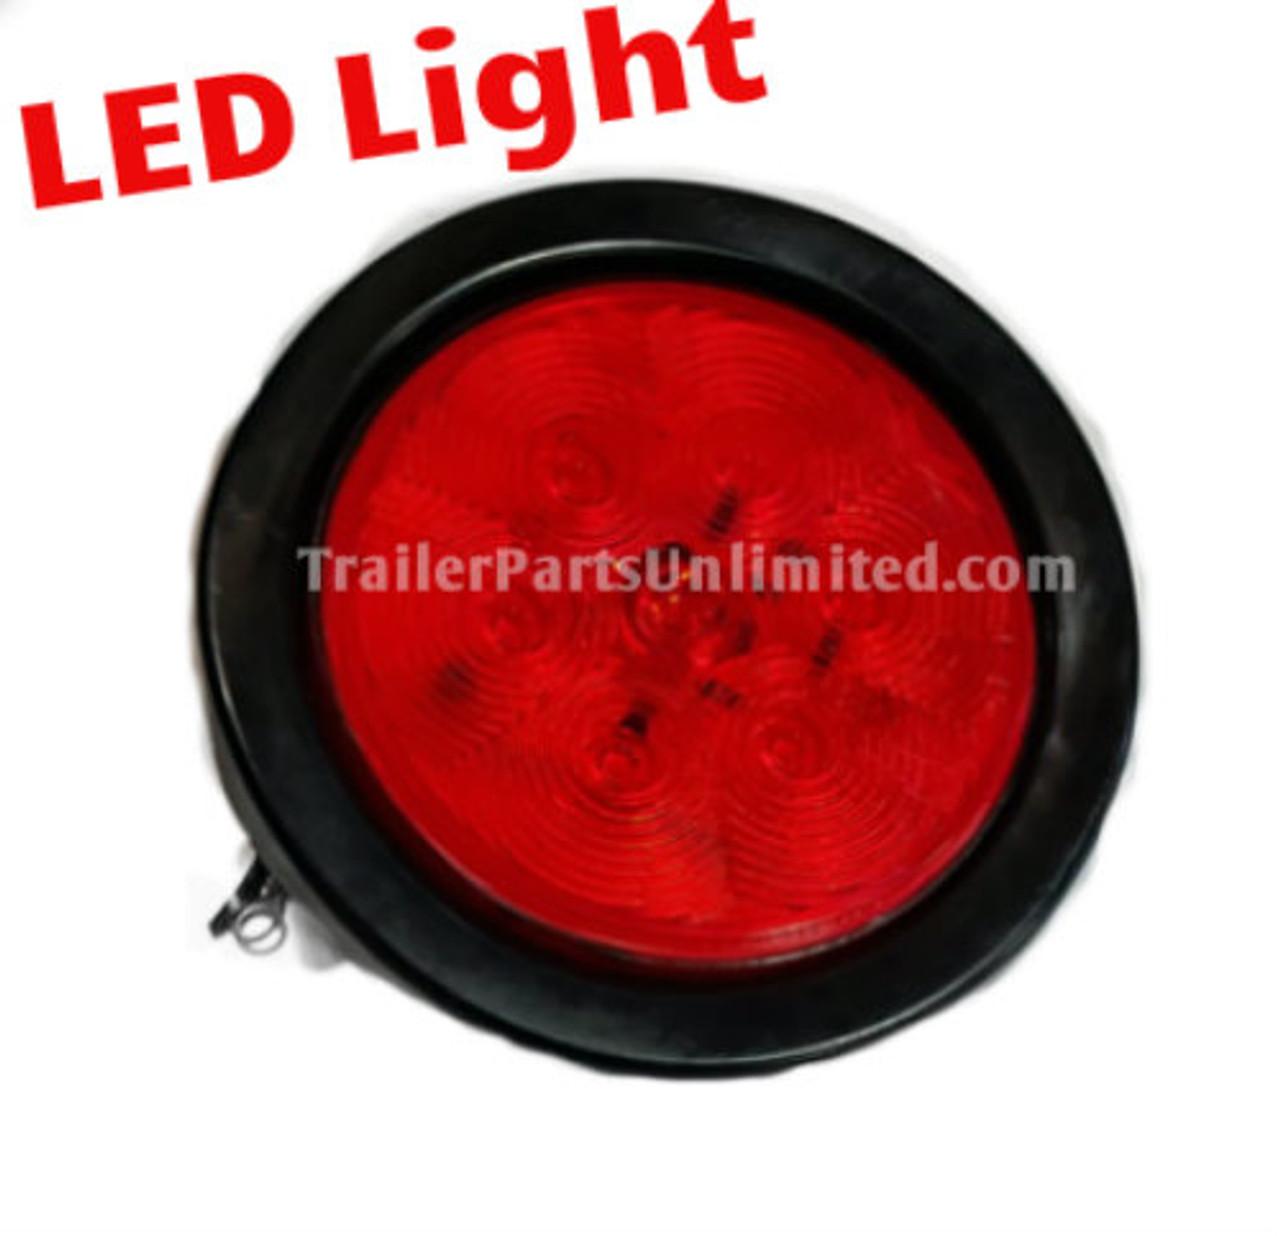 Trailer Lights On Trailer Wiring Diagram Light Plug Brakes Hitch 4